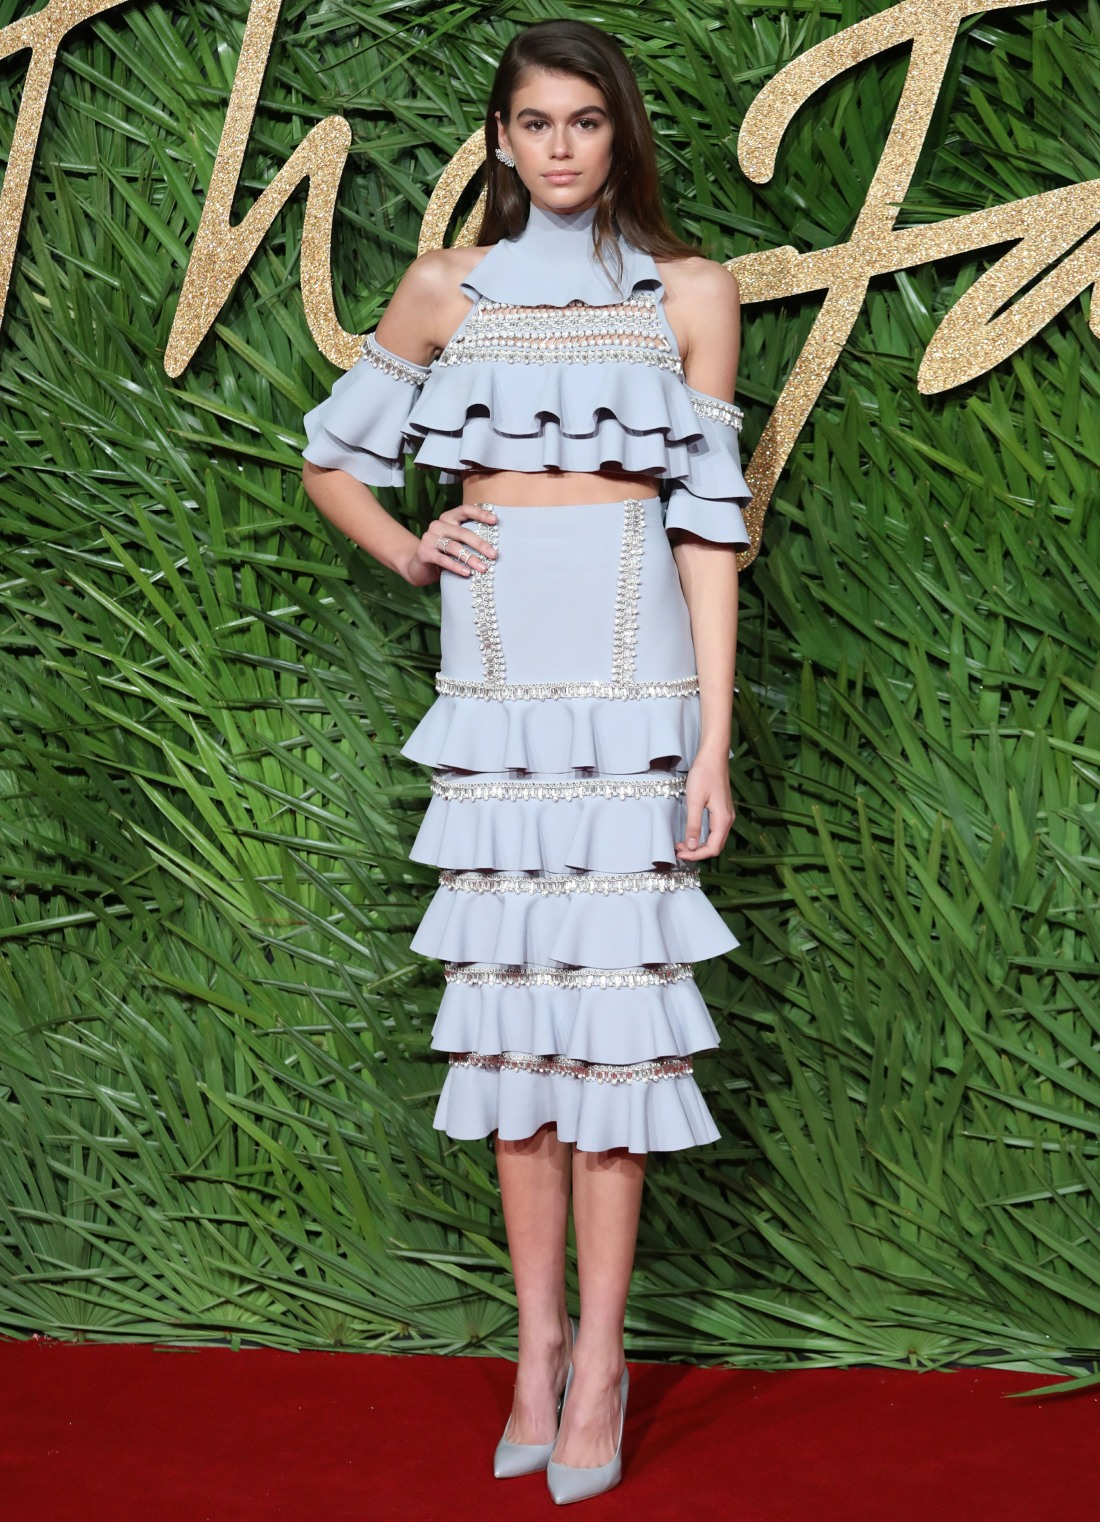 The London Fashion Awards